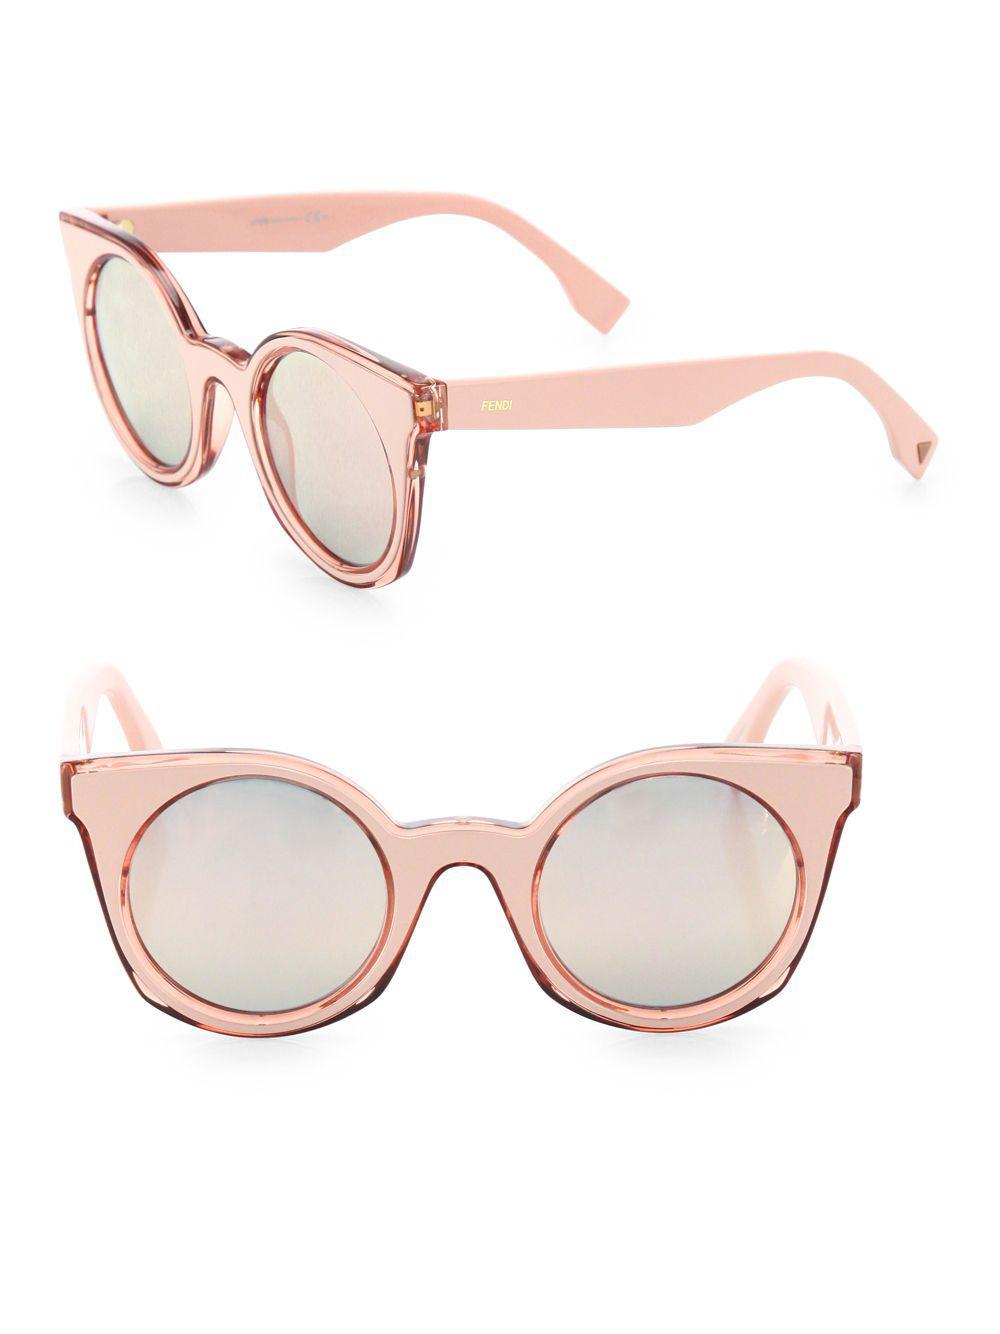 eab8b73051e Lyst - Fendi 48mm Rounded Cat-eye Sunglasses